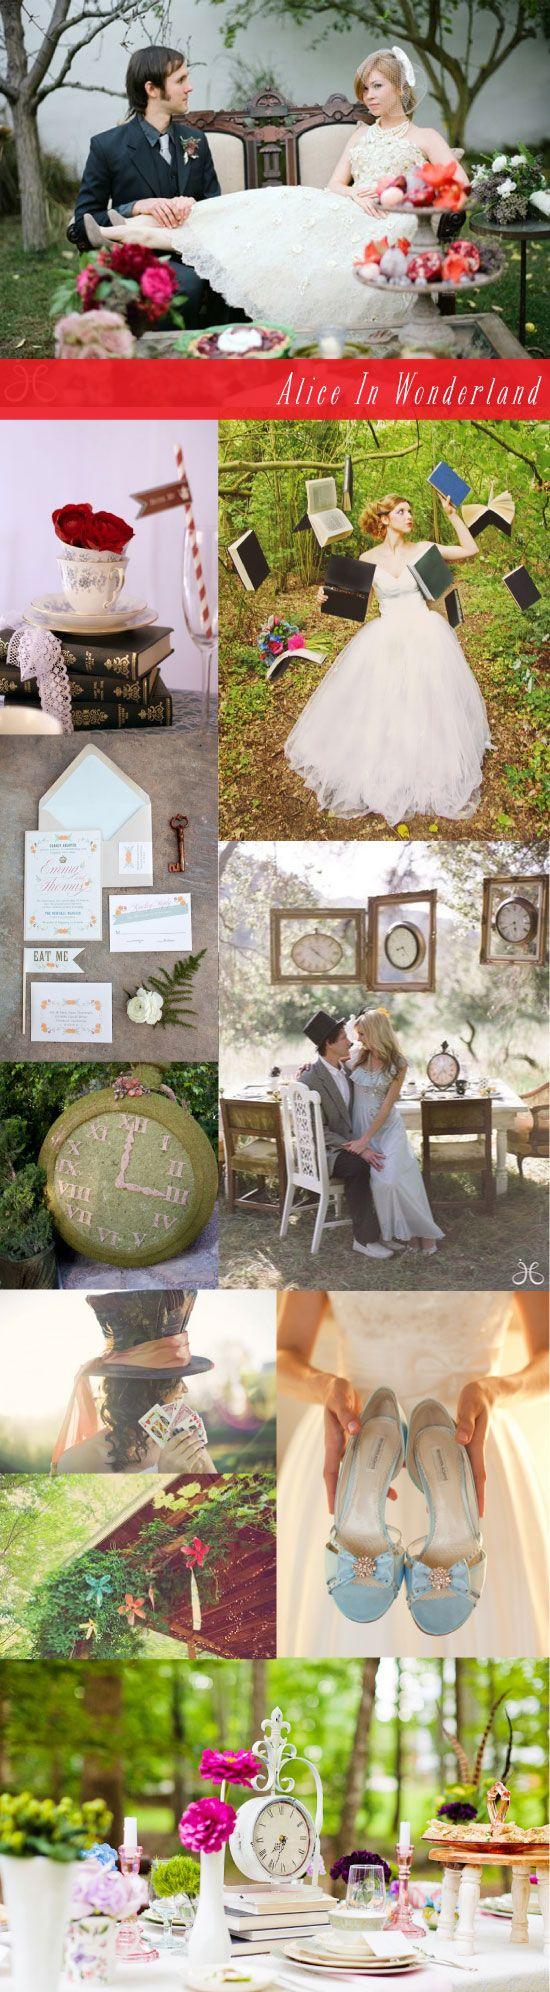 best vintage wedding images on pinterest wedding ideas